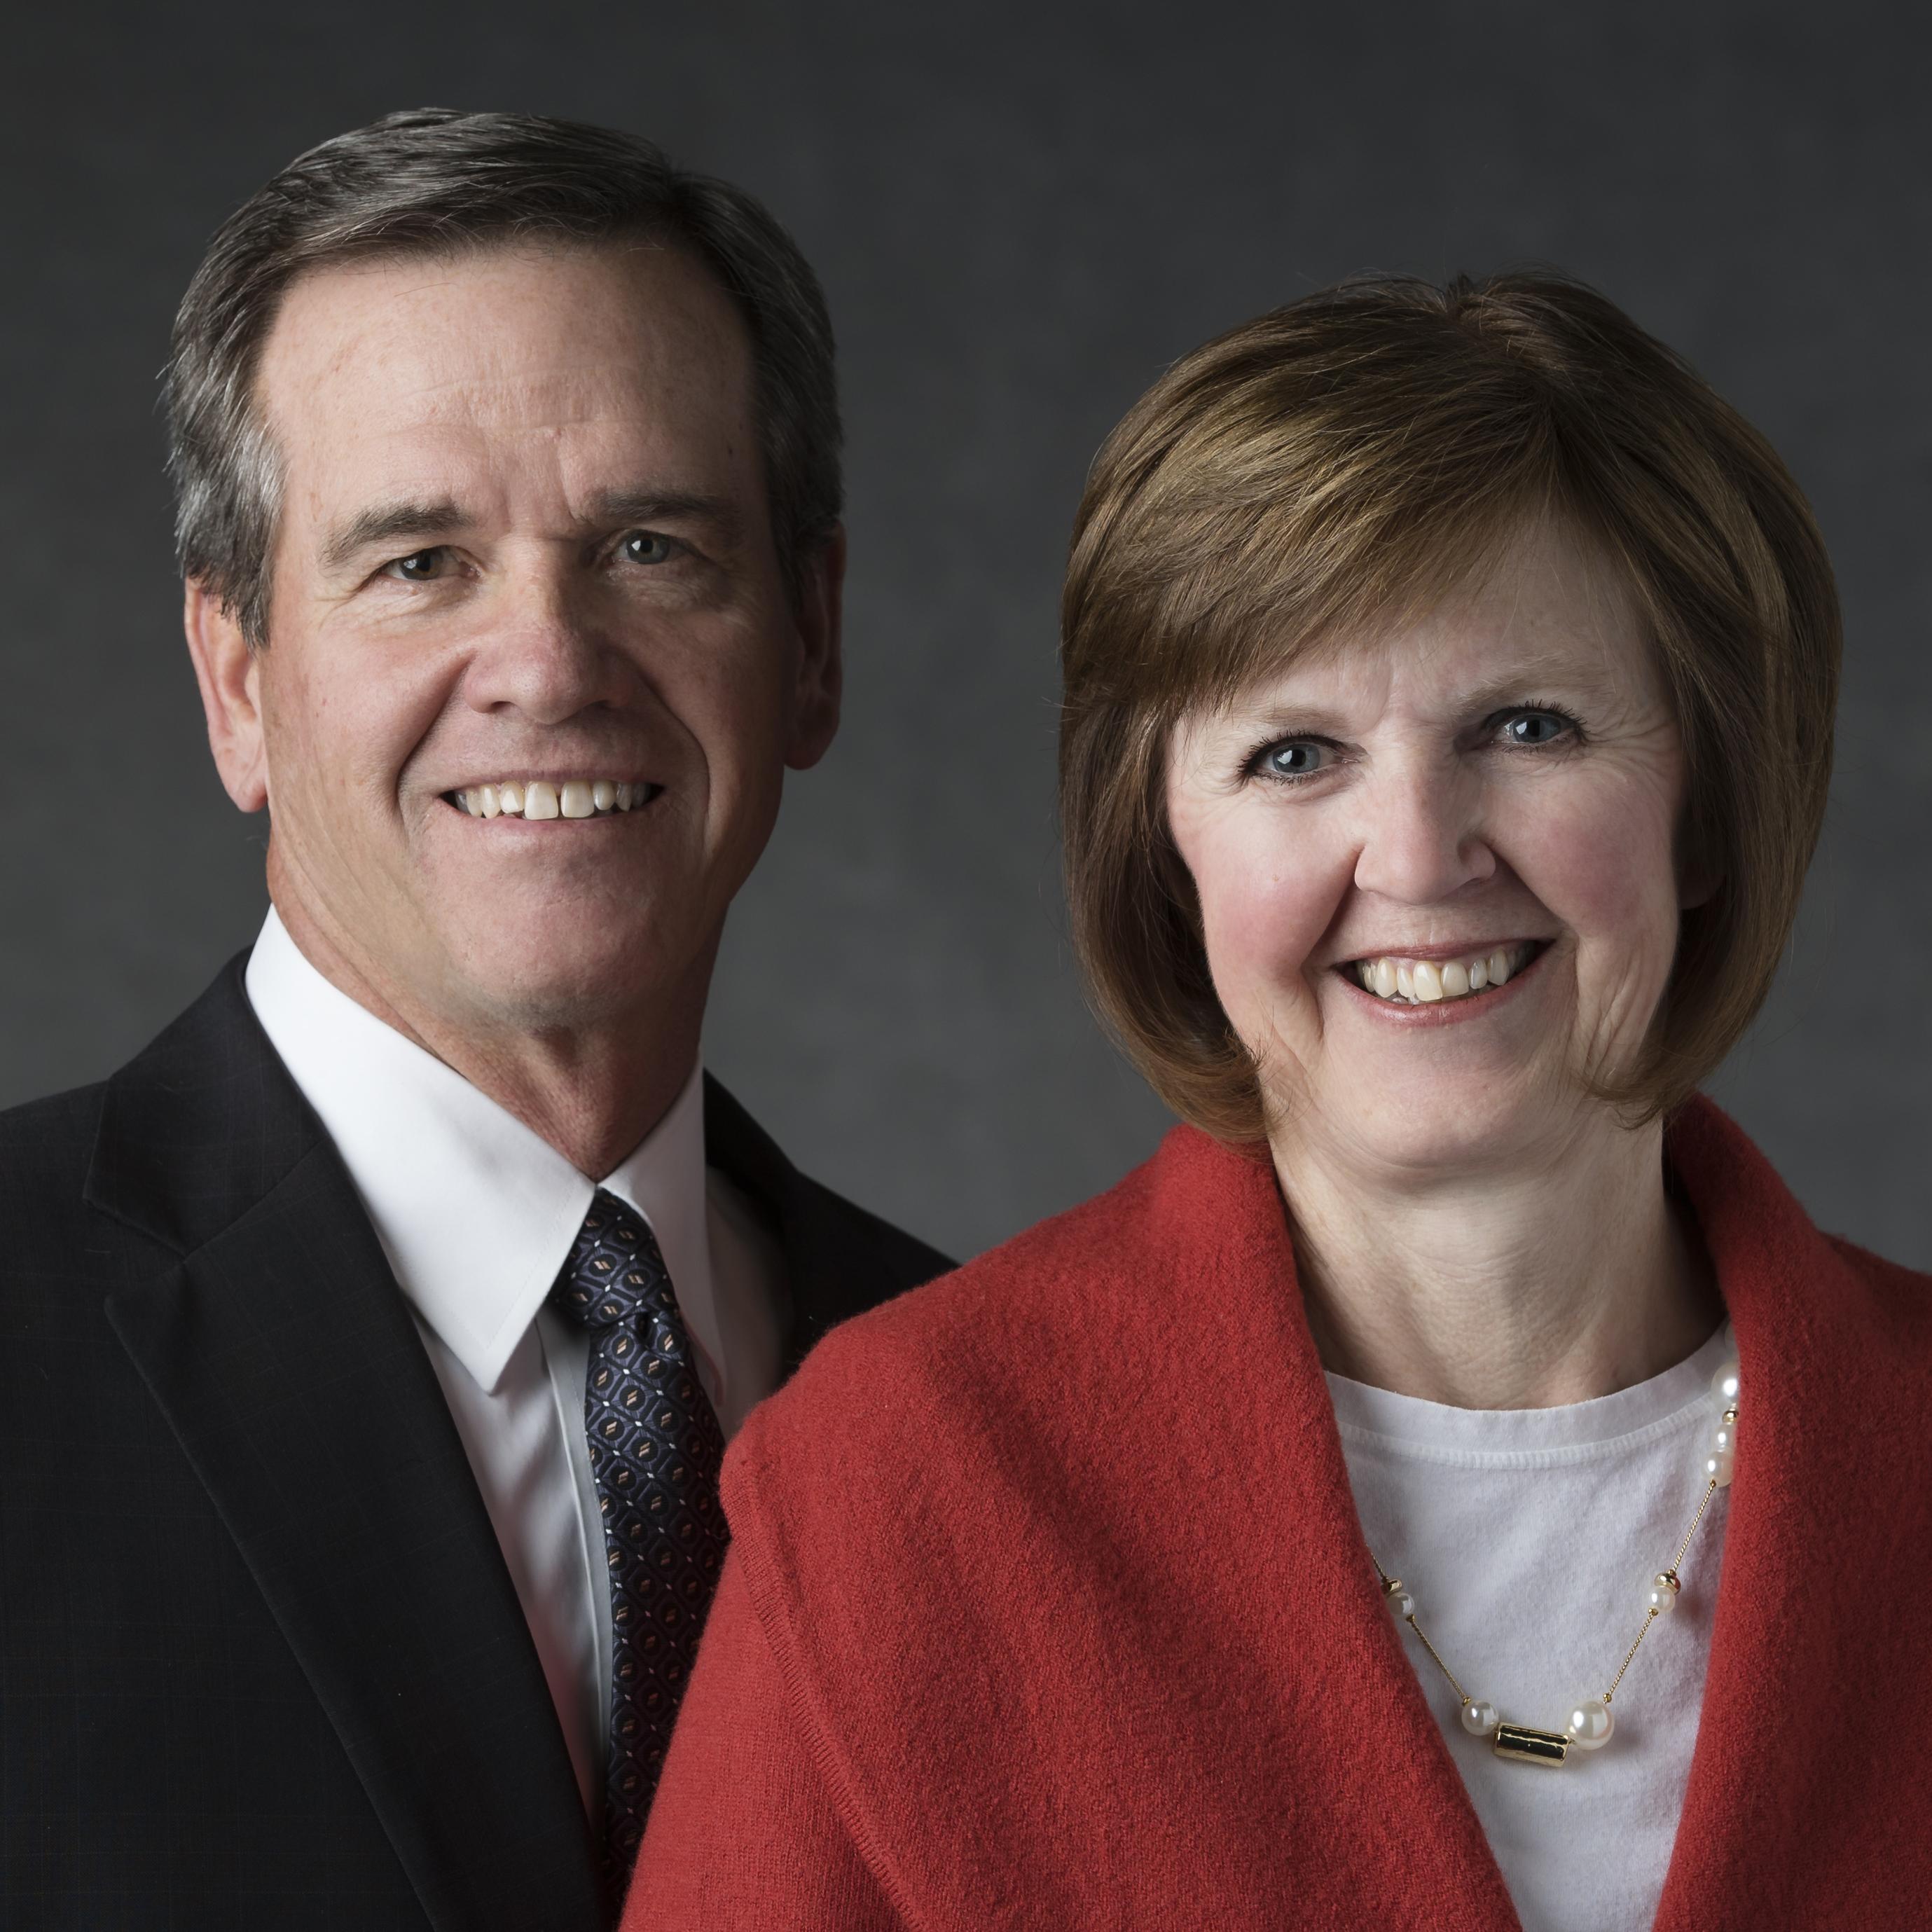 Scott D. and Janice B. Hintze